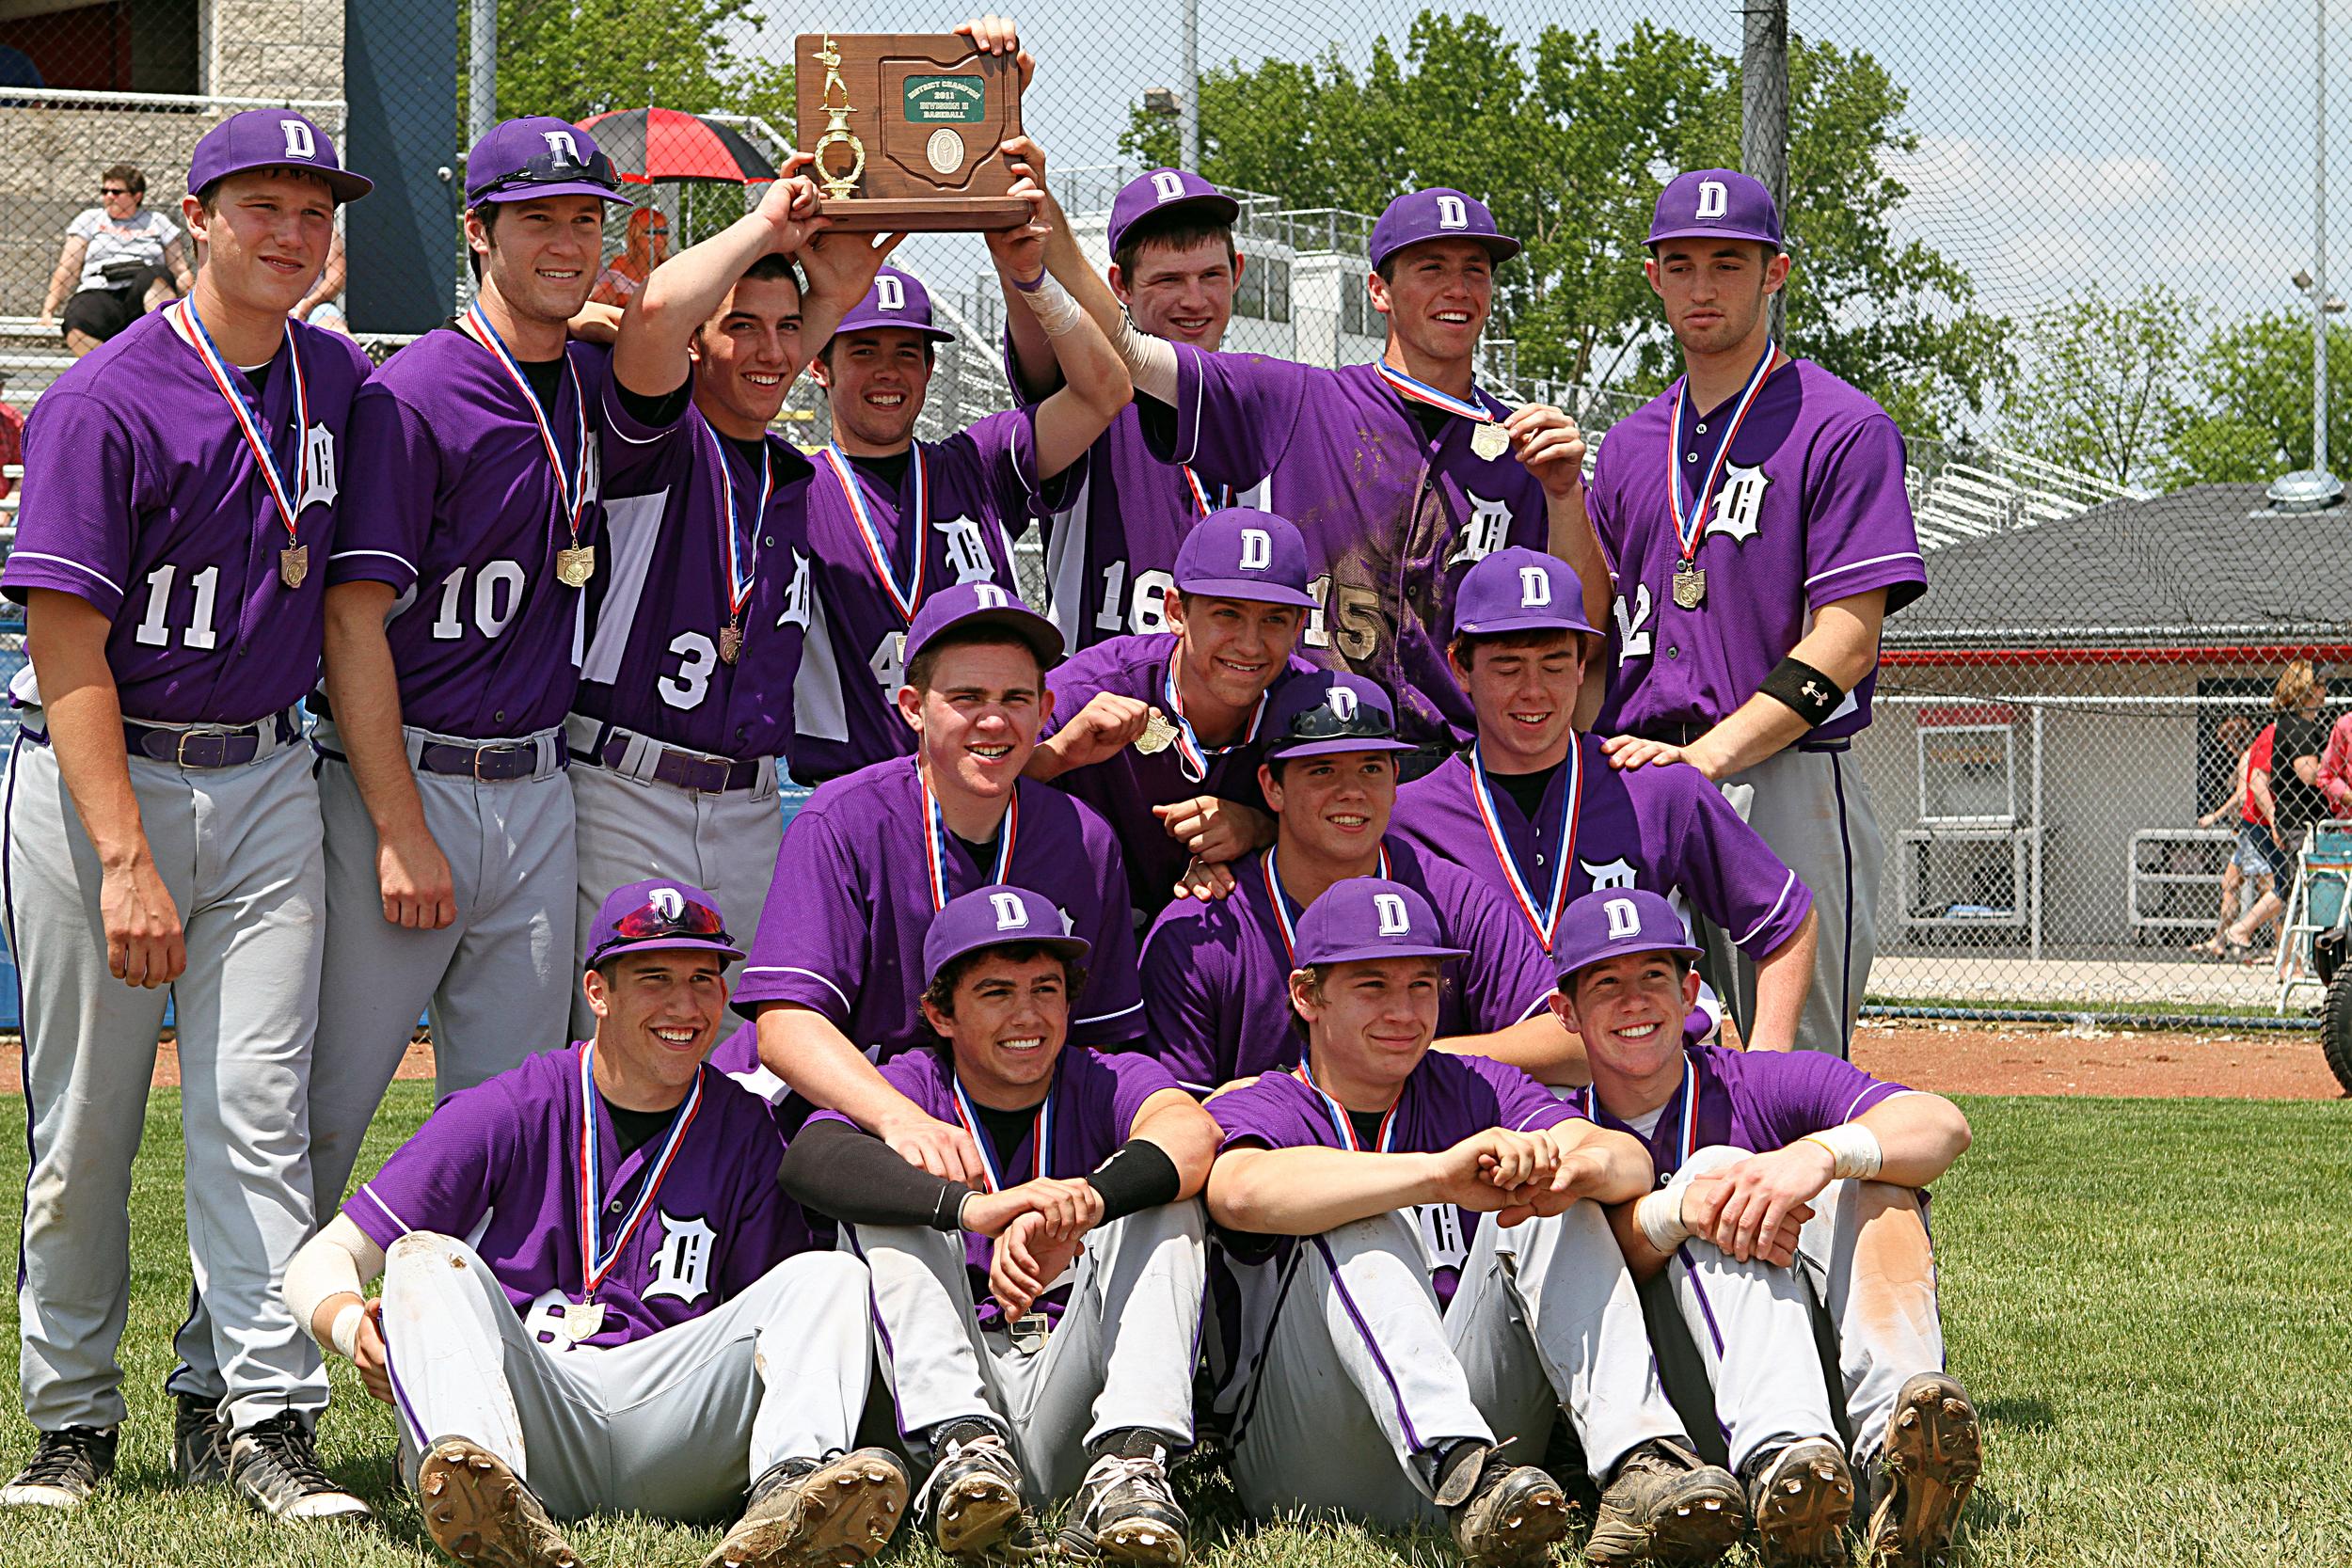 2011 District Champions